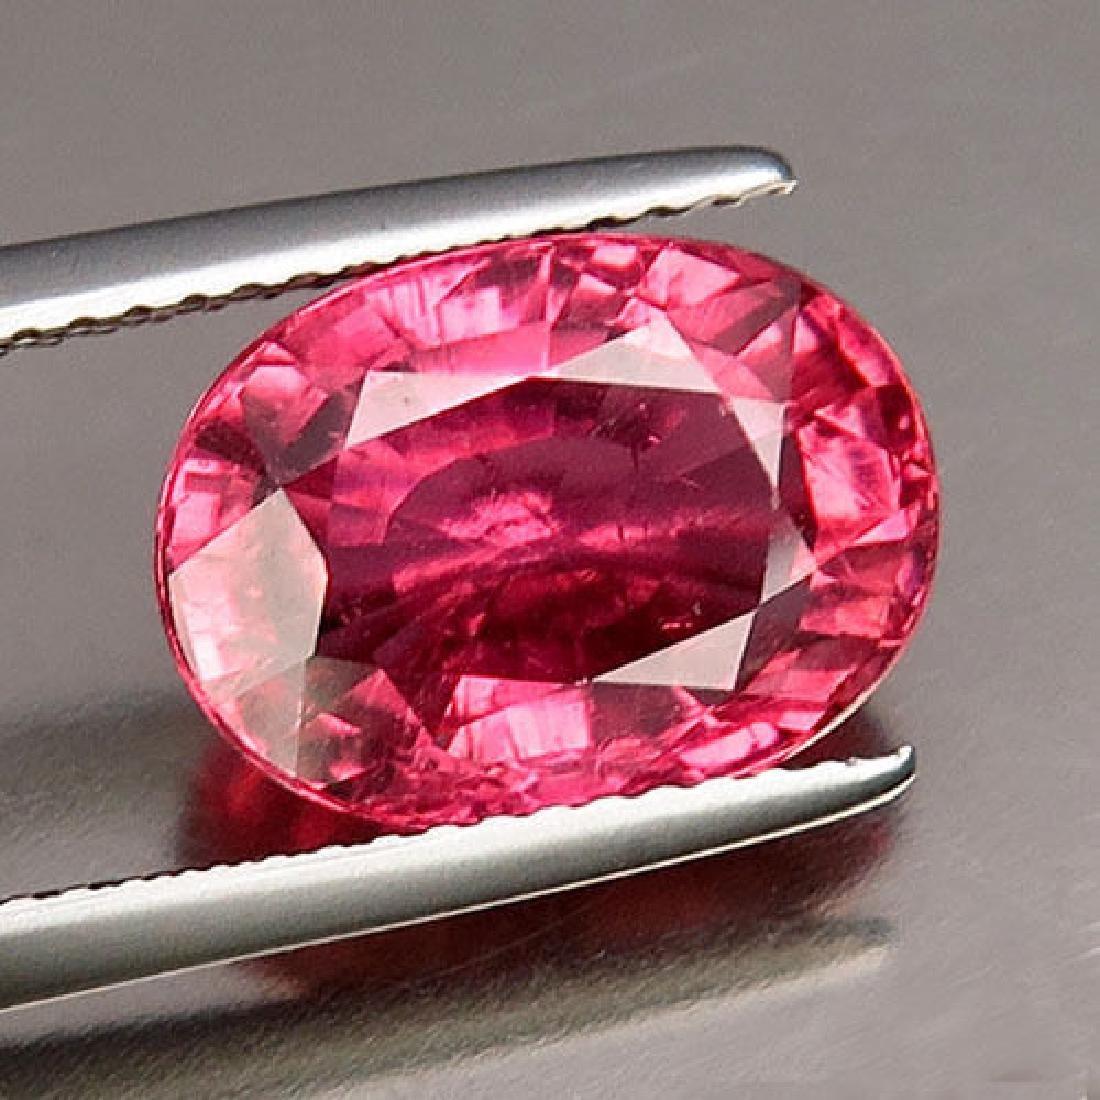 Natural Hot Pink Tourmaline 5.19 ct - no Treatment